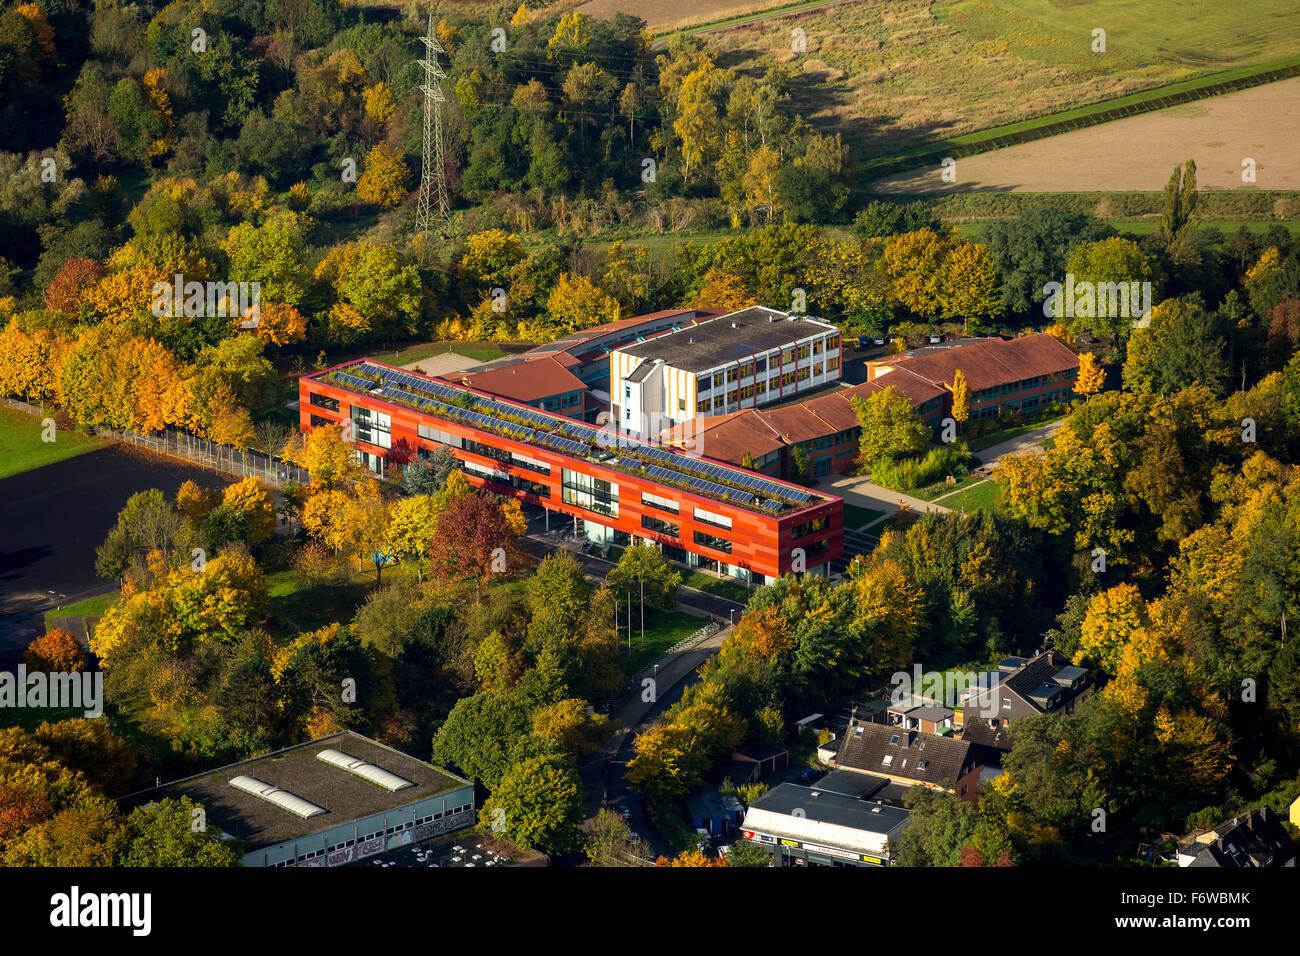 Gymnasium Essen-Überruhr, school, secondary education, Essen, Ruhr area, North rhine westphalia, Germany, Europe, - Stock Image